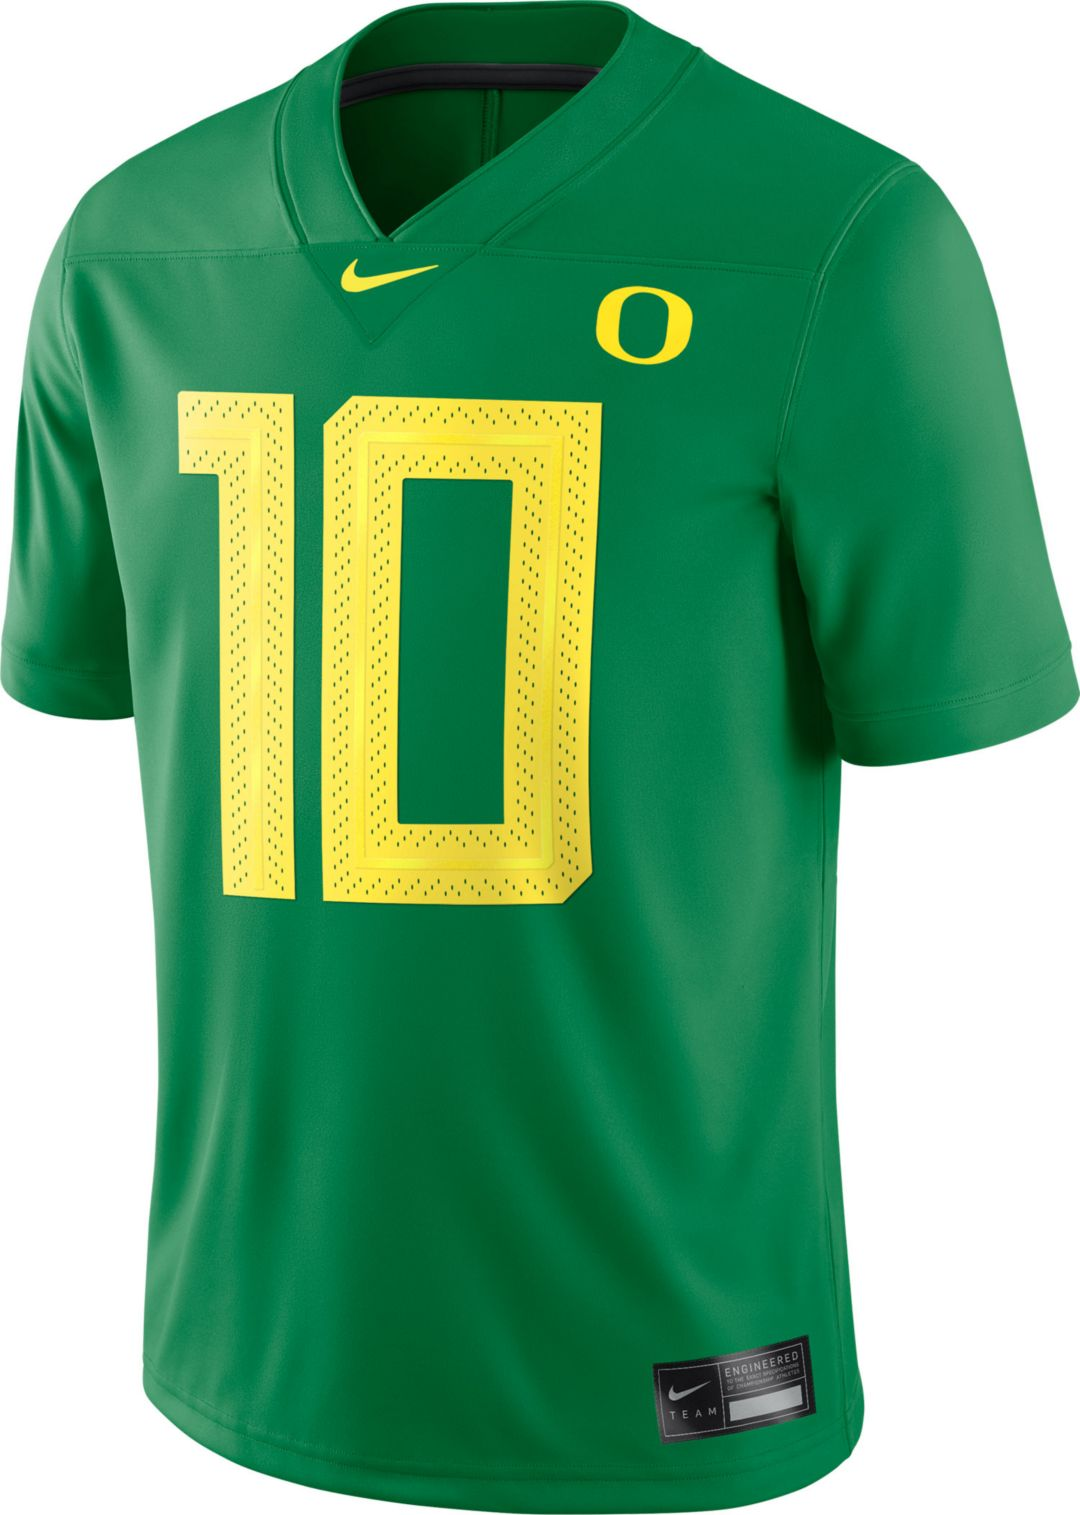 online retailer 56eda 854b0 Nike Men's Oregon Ducks #36 Green Dri-FIT Game Football Jersey